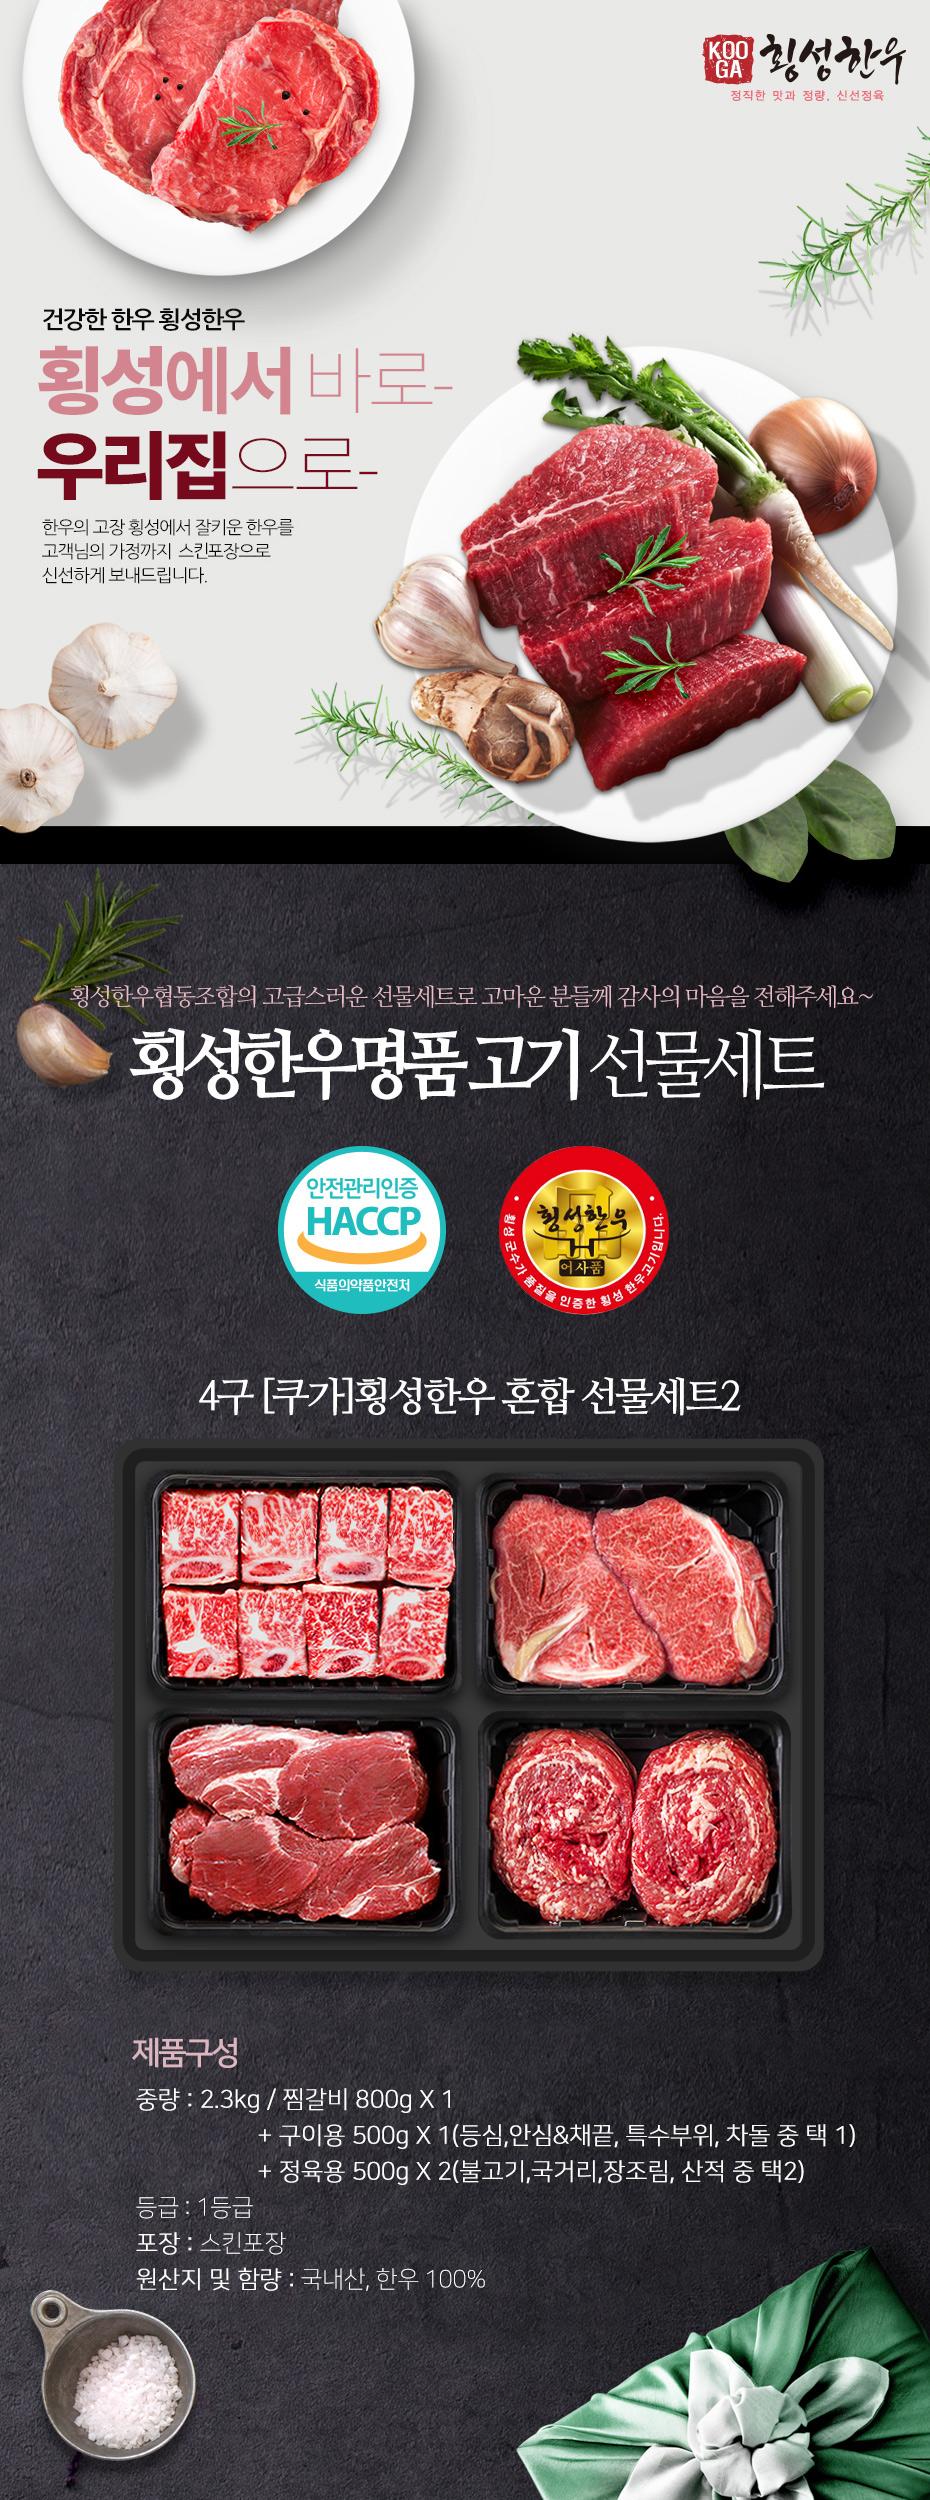 set4_meat_rib1_ten1_s2_003800.jpg